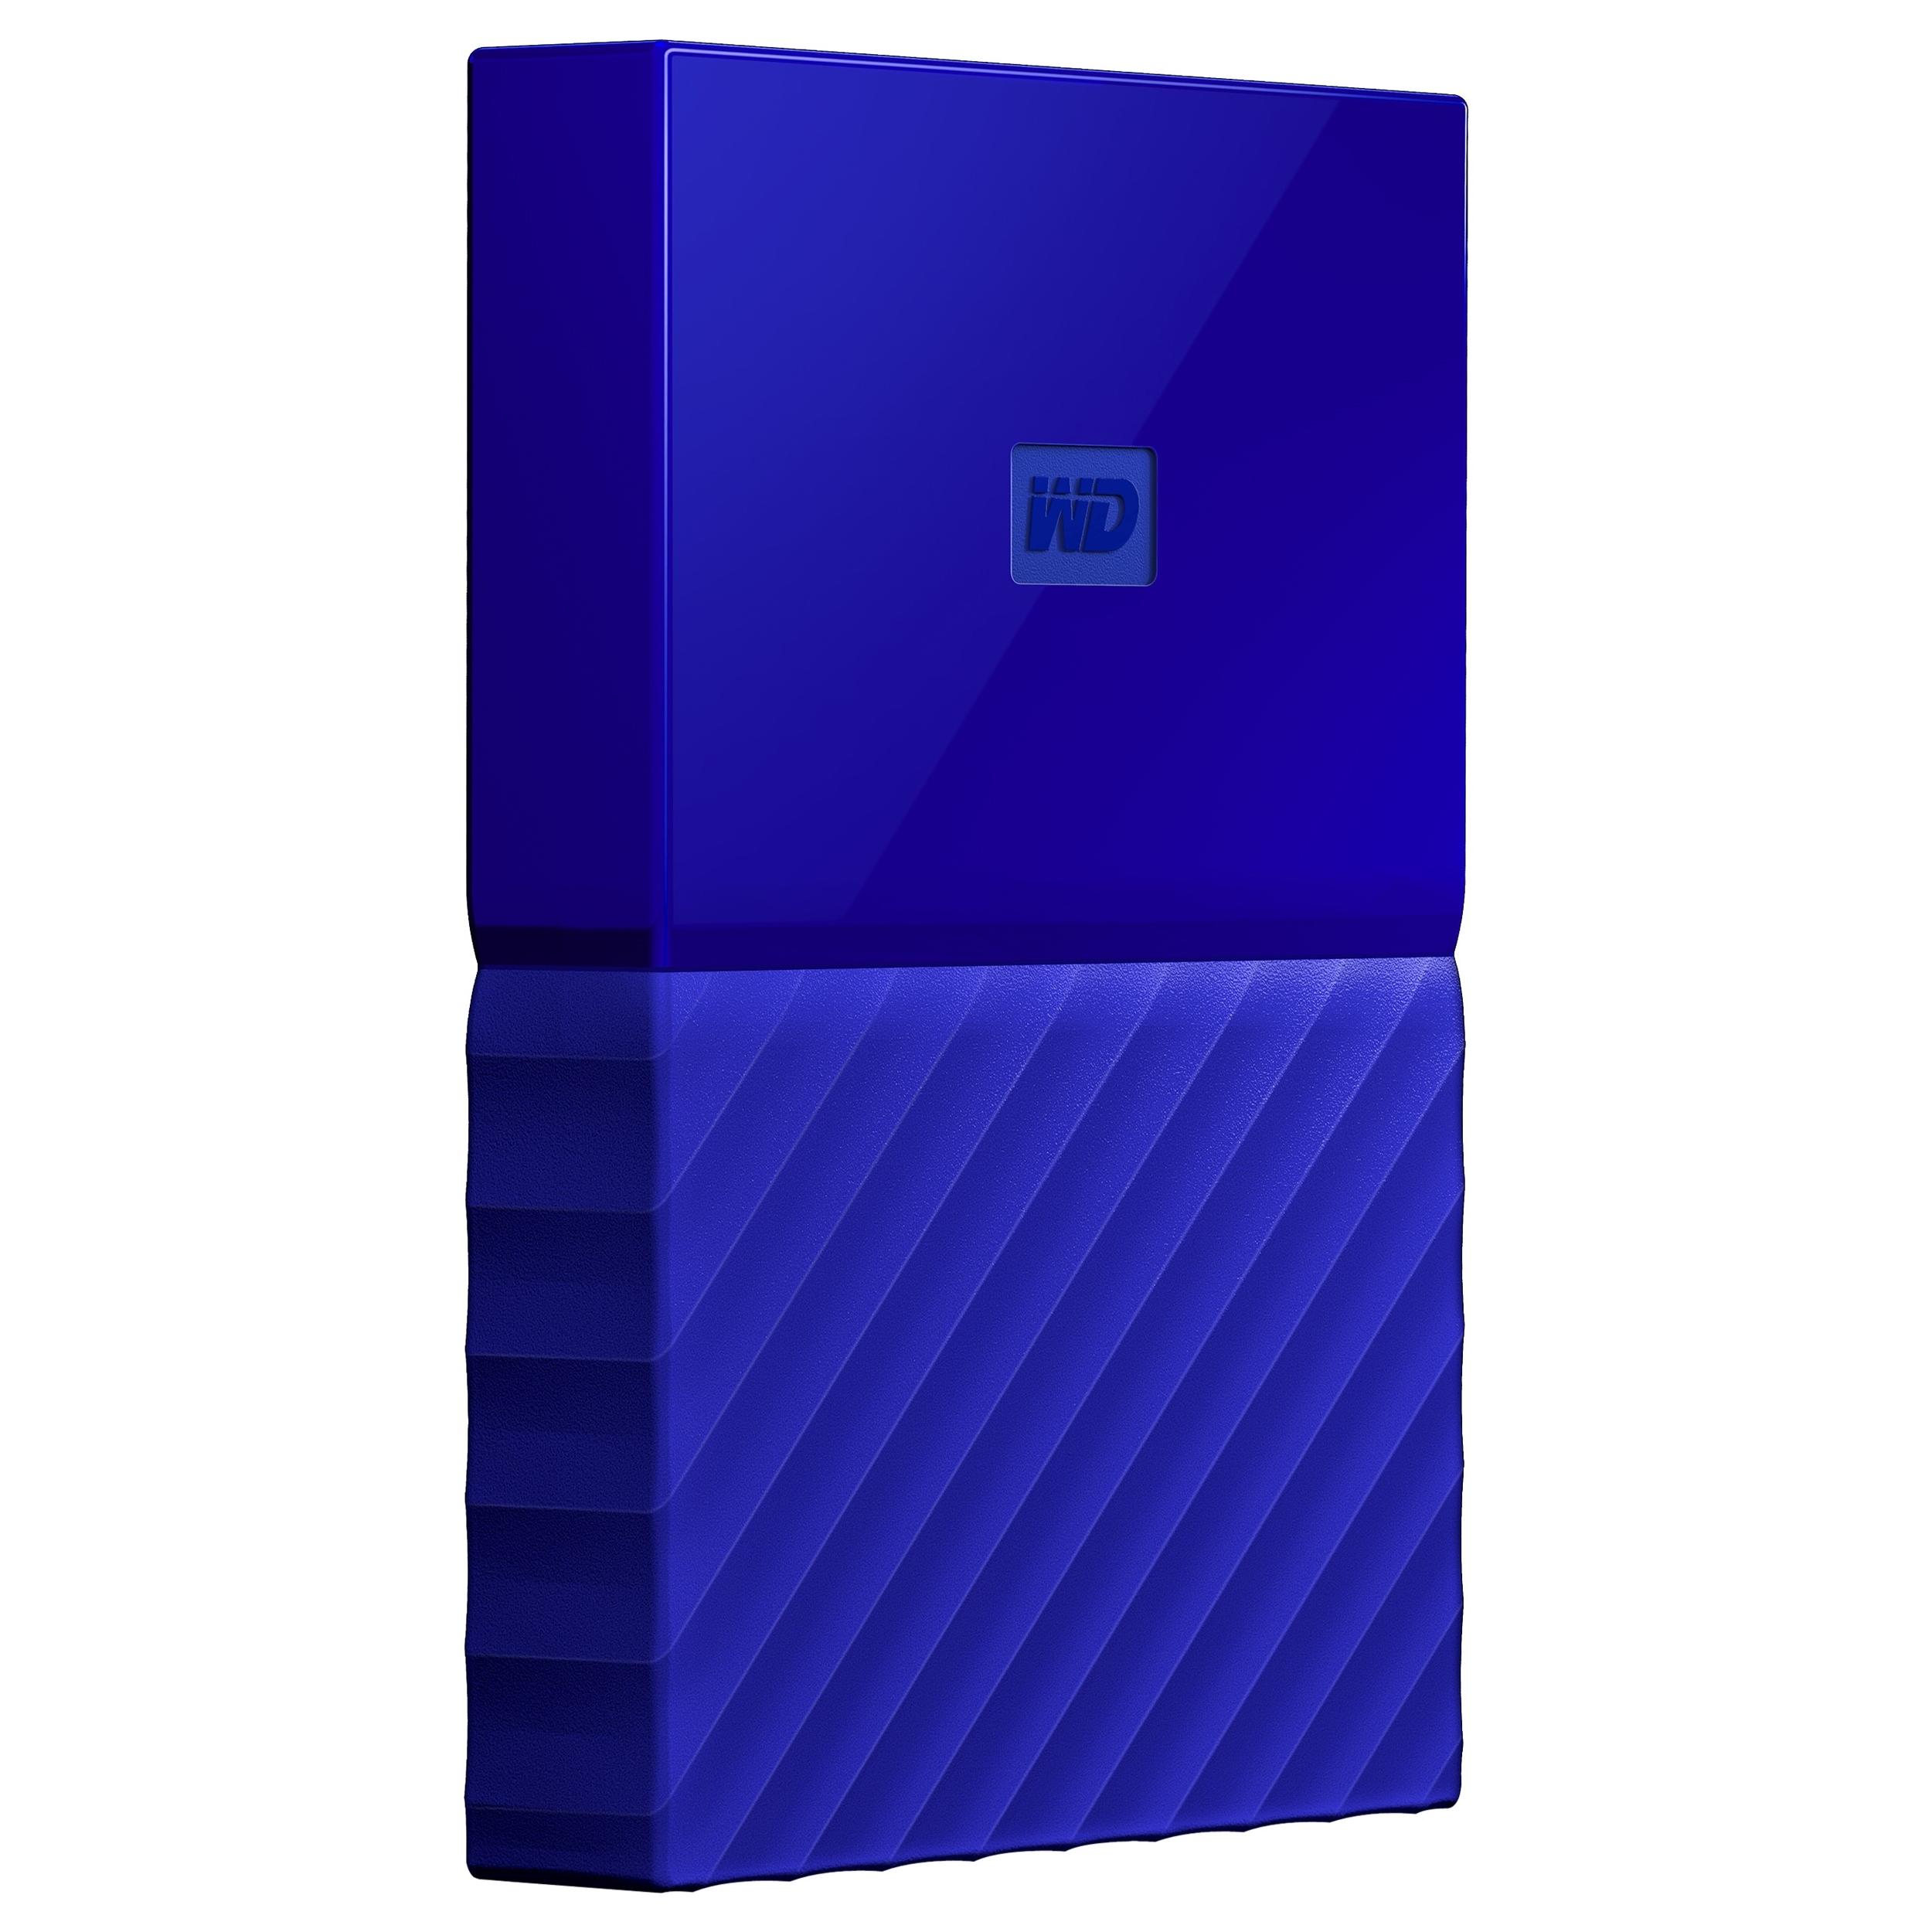 WD My Passport WDBYFT00BBL-WESN 2 TB External Hard Drive - USB 3.0 - Portable 6